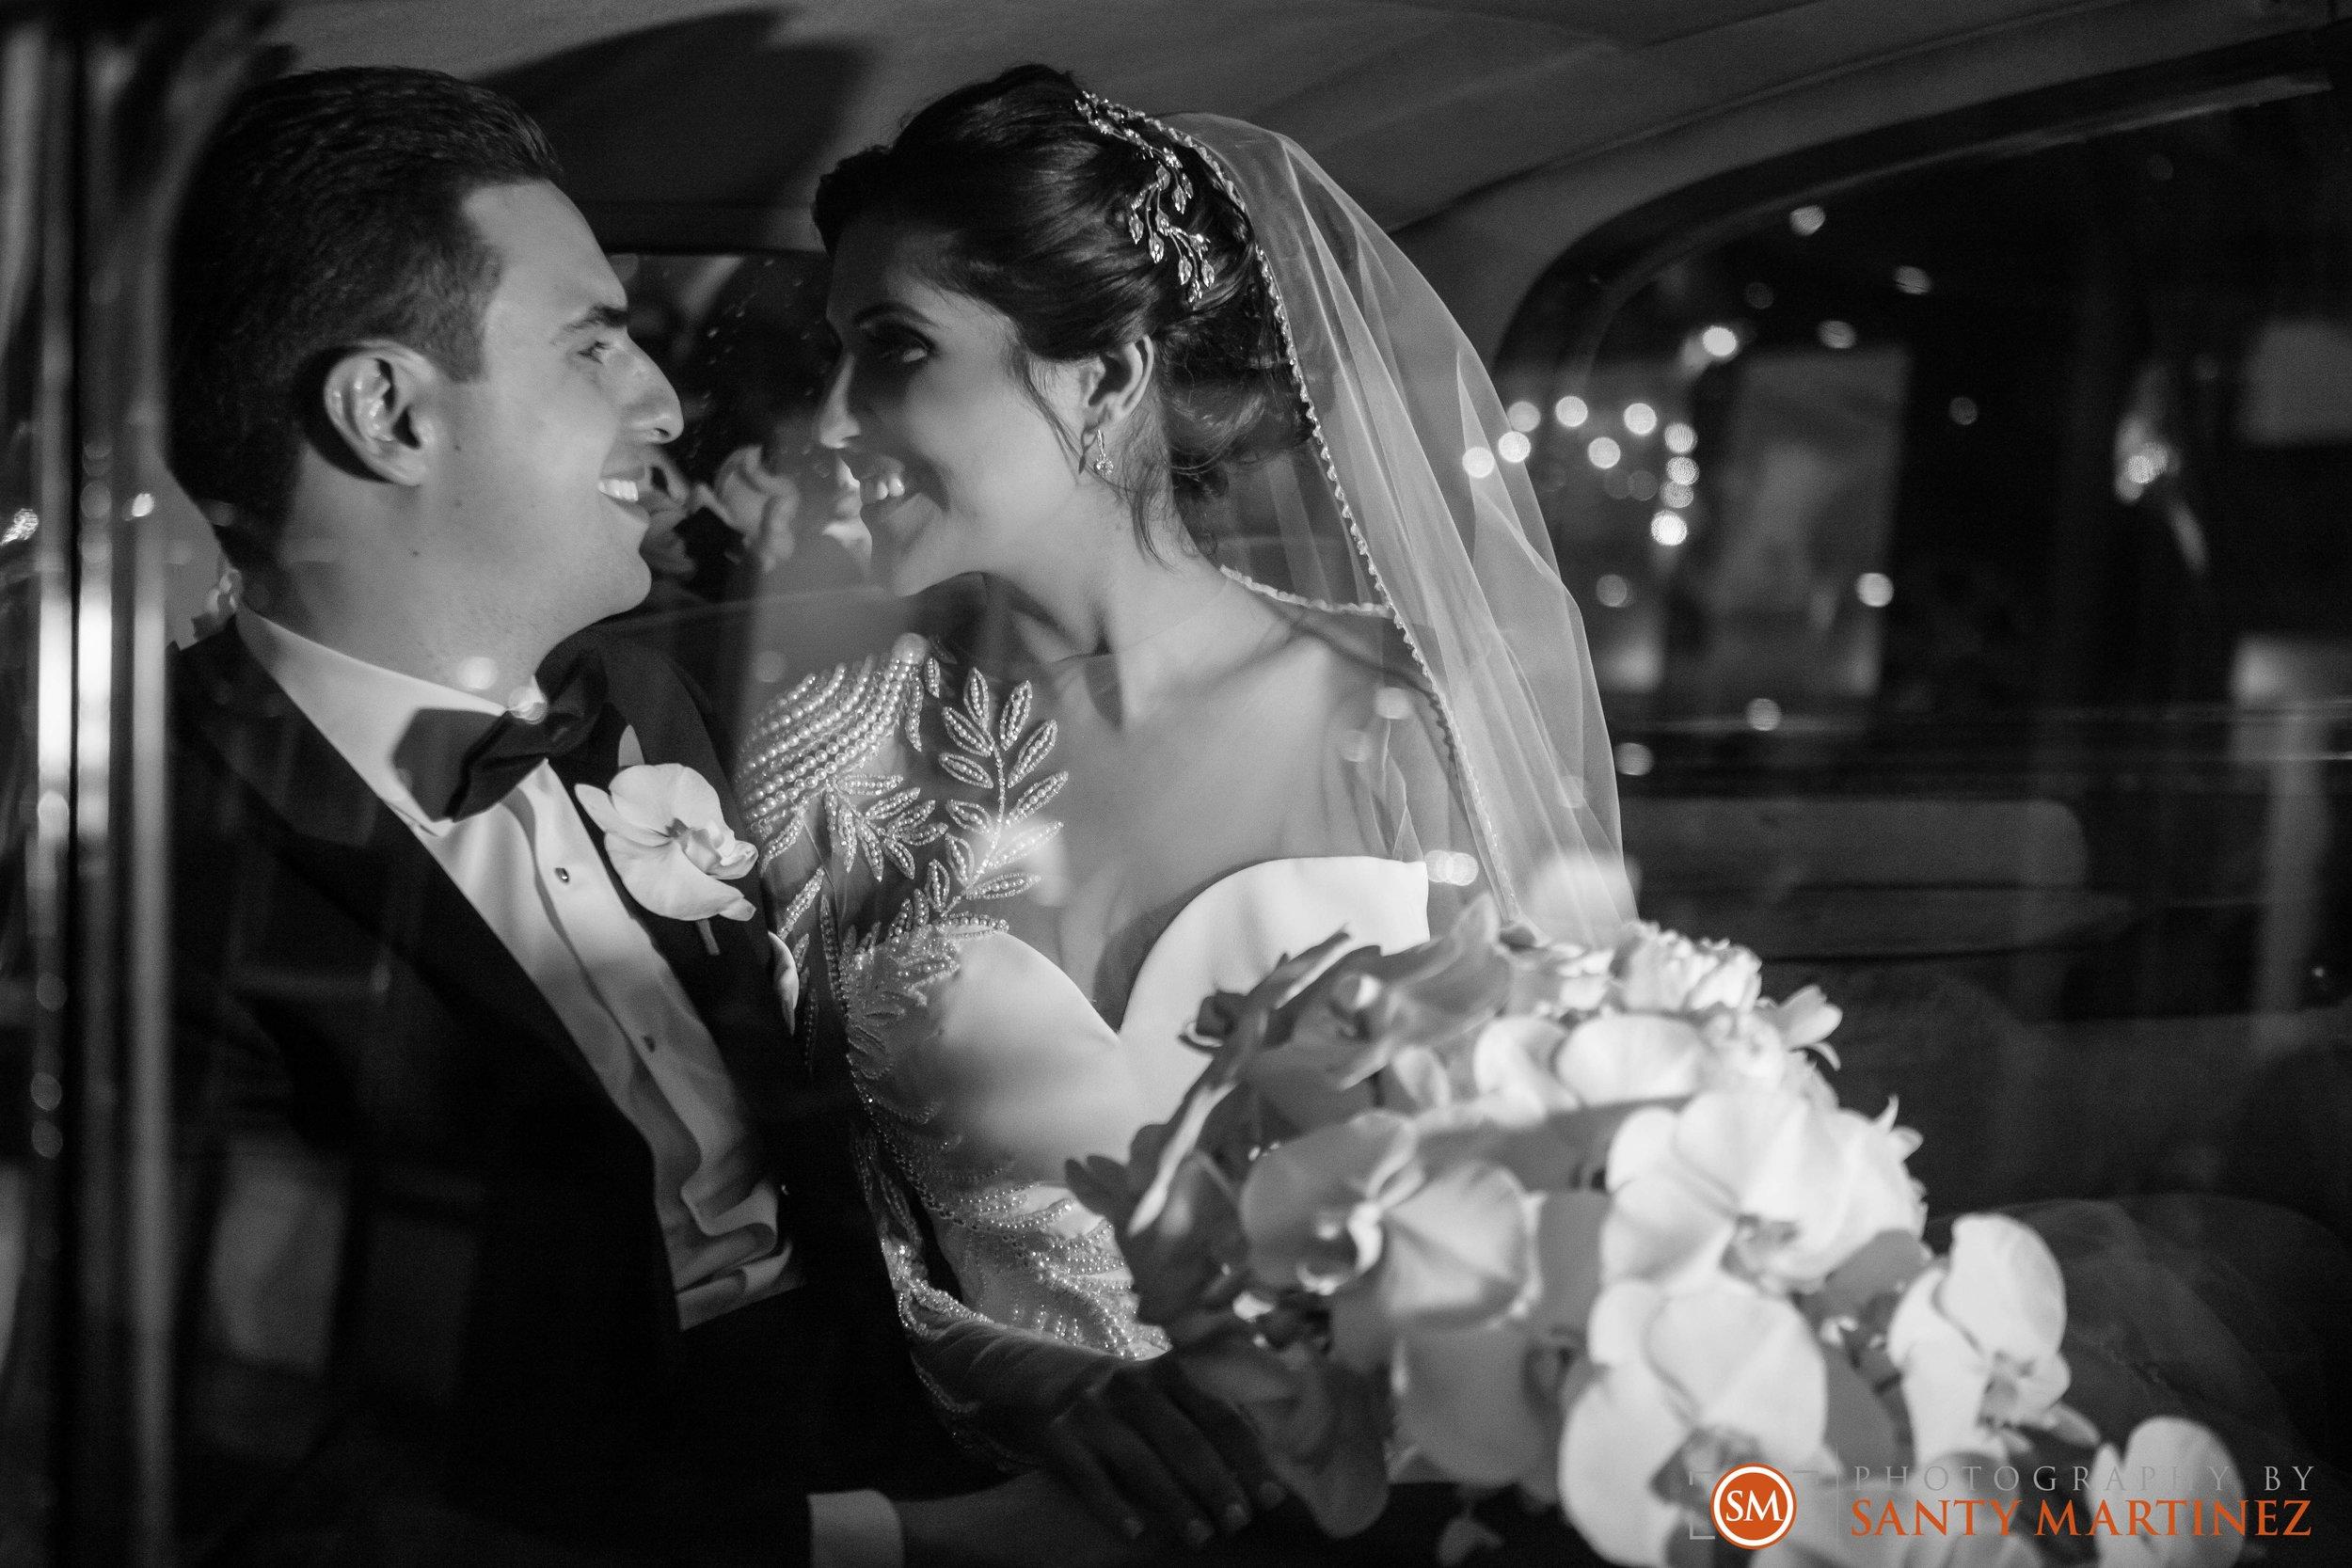 Wedding Trump National Doral Miami - Photography by Santy Martinez-20.jpg